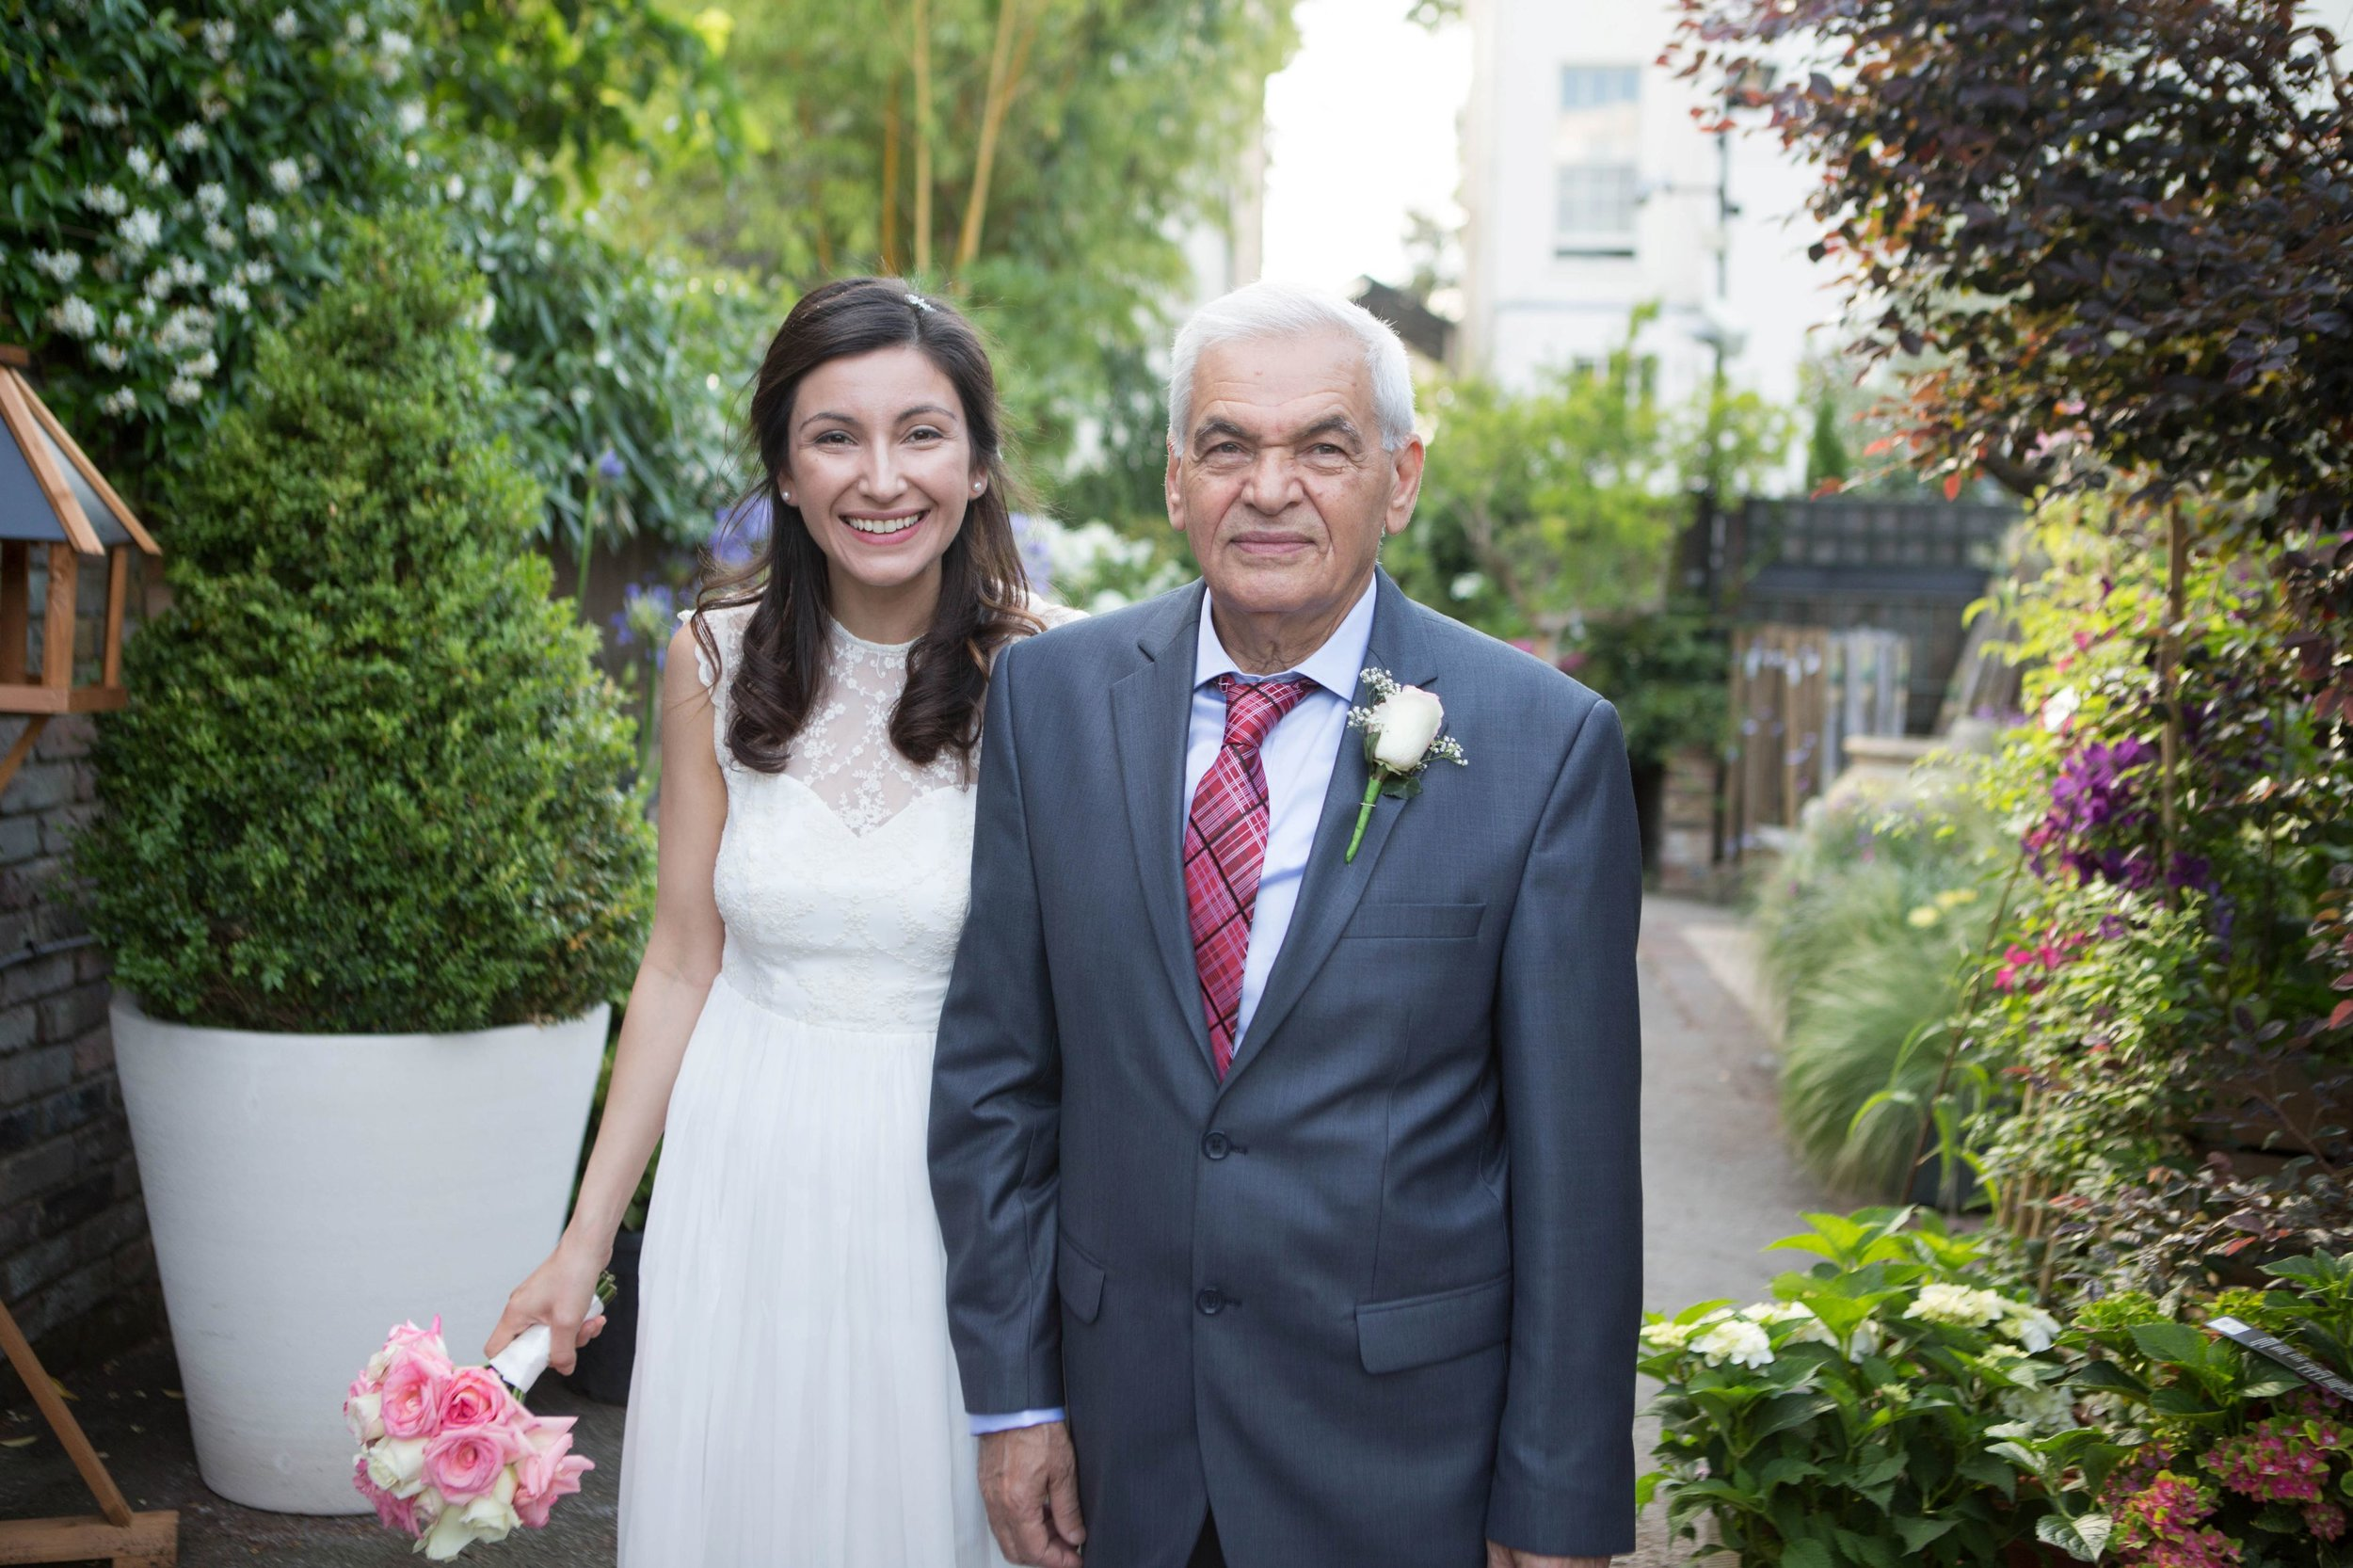 Hulya_&_Ben's_Clifton_Nurseries_London_Wedding_0144.jpg